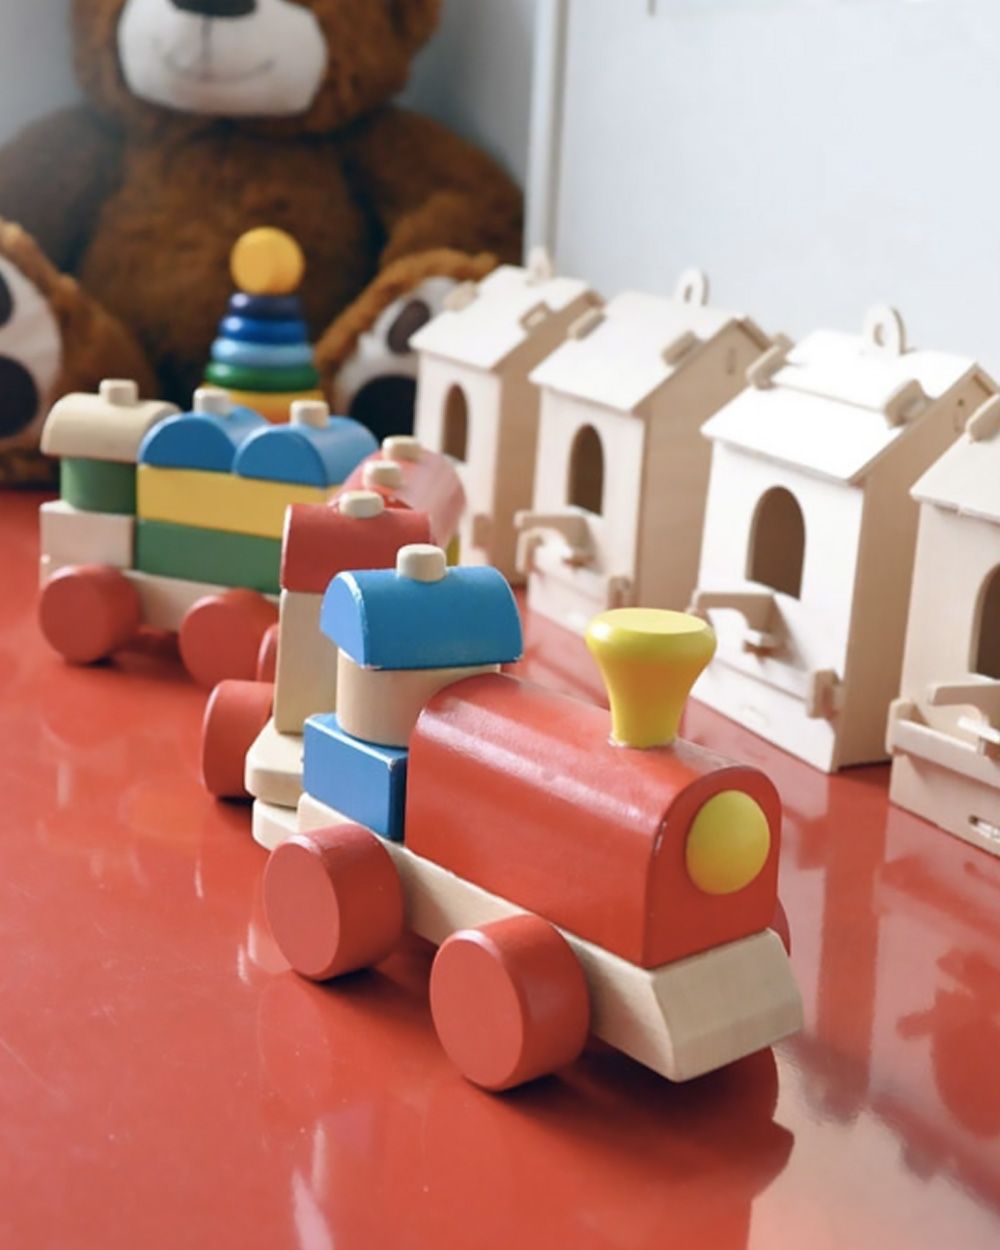 jouets en bois sur buffet rouge en métal